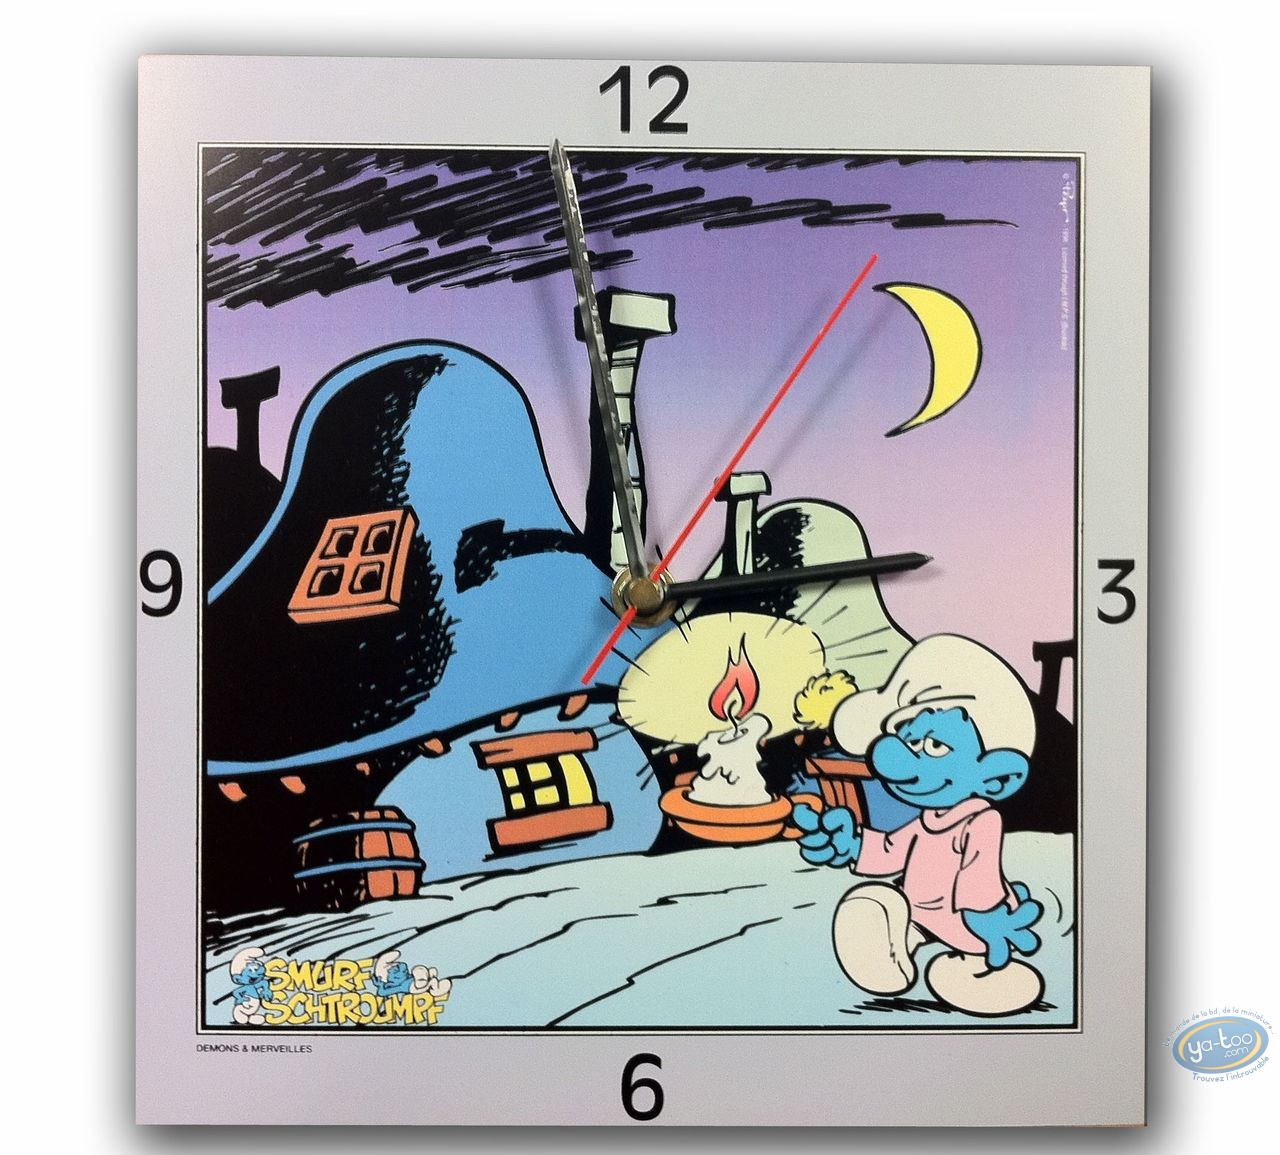 Clocks & Watches, Smurfs (The) : Clock, The Smurf : night